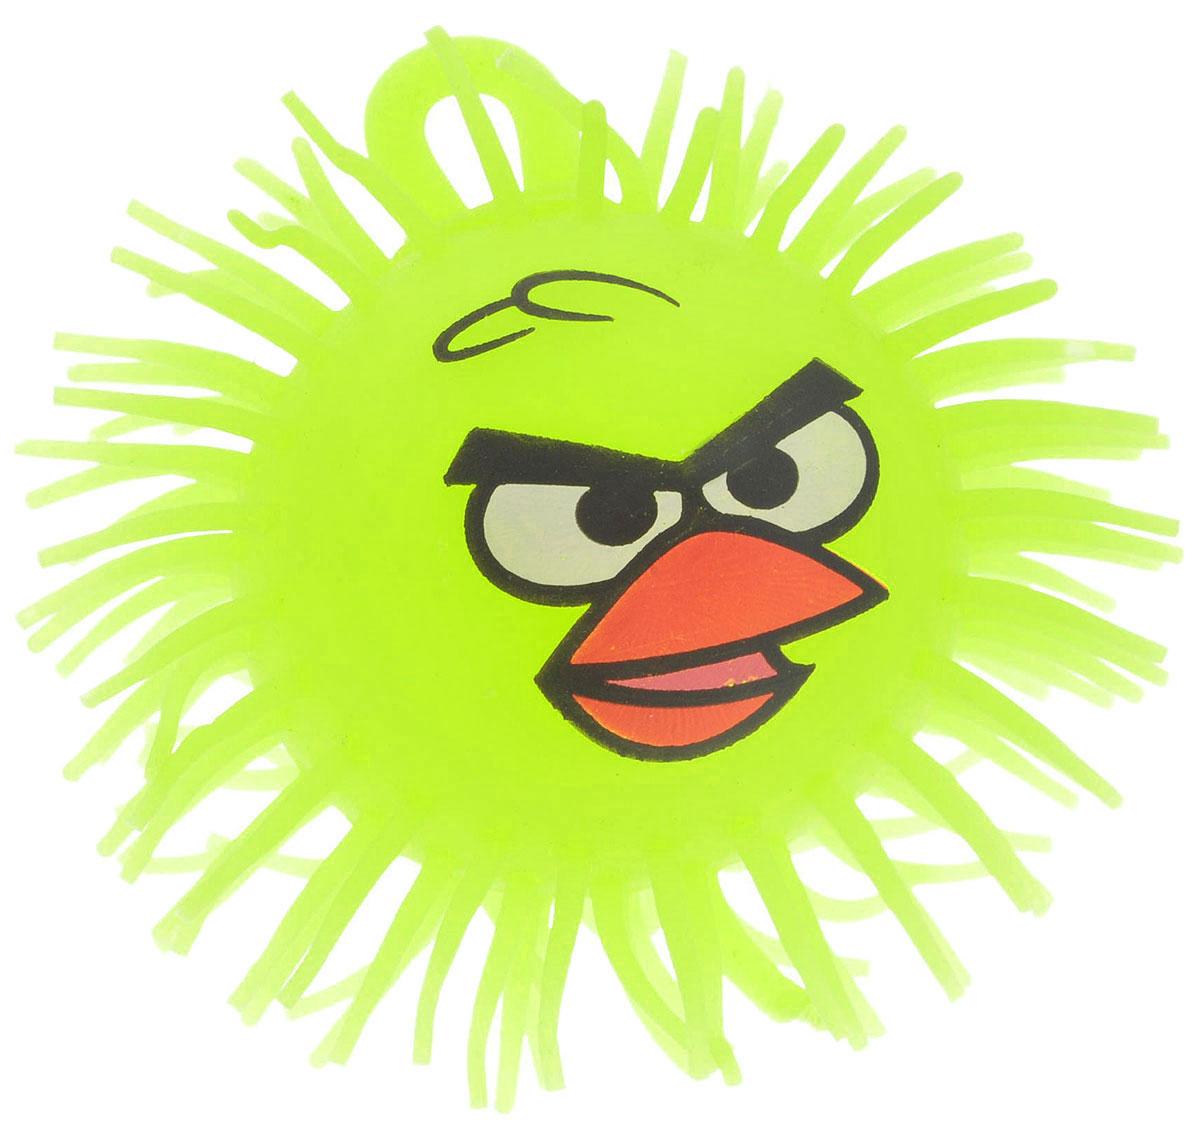 1TOY Игрушка-антистресс Ё-Ёжик Злая птичка цвет желтый increase 60 100mm super long soft penis extender sleeve enlargement reusable condoms adult sex toys for men cock sleeve condom